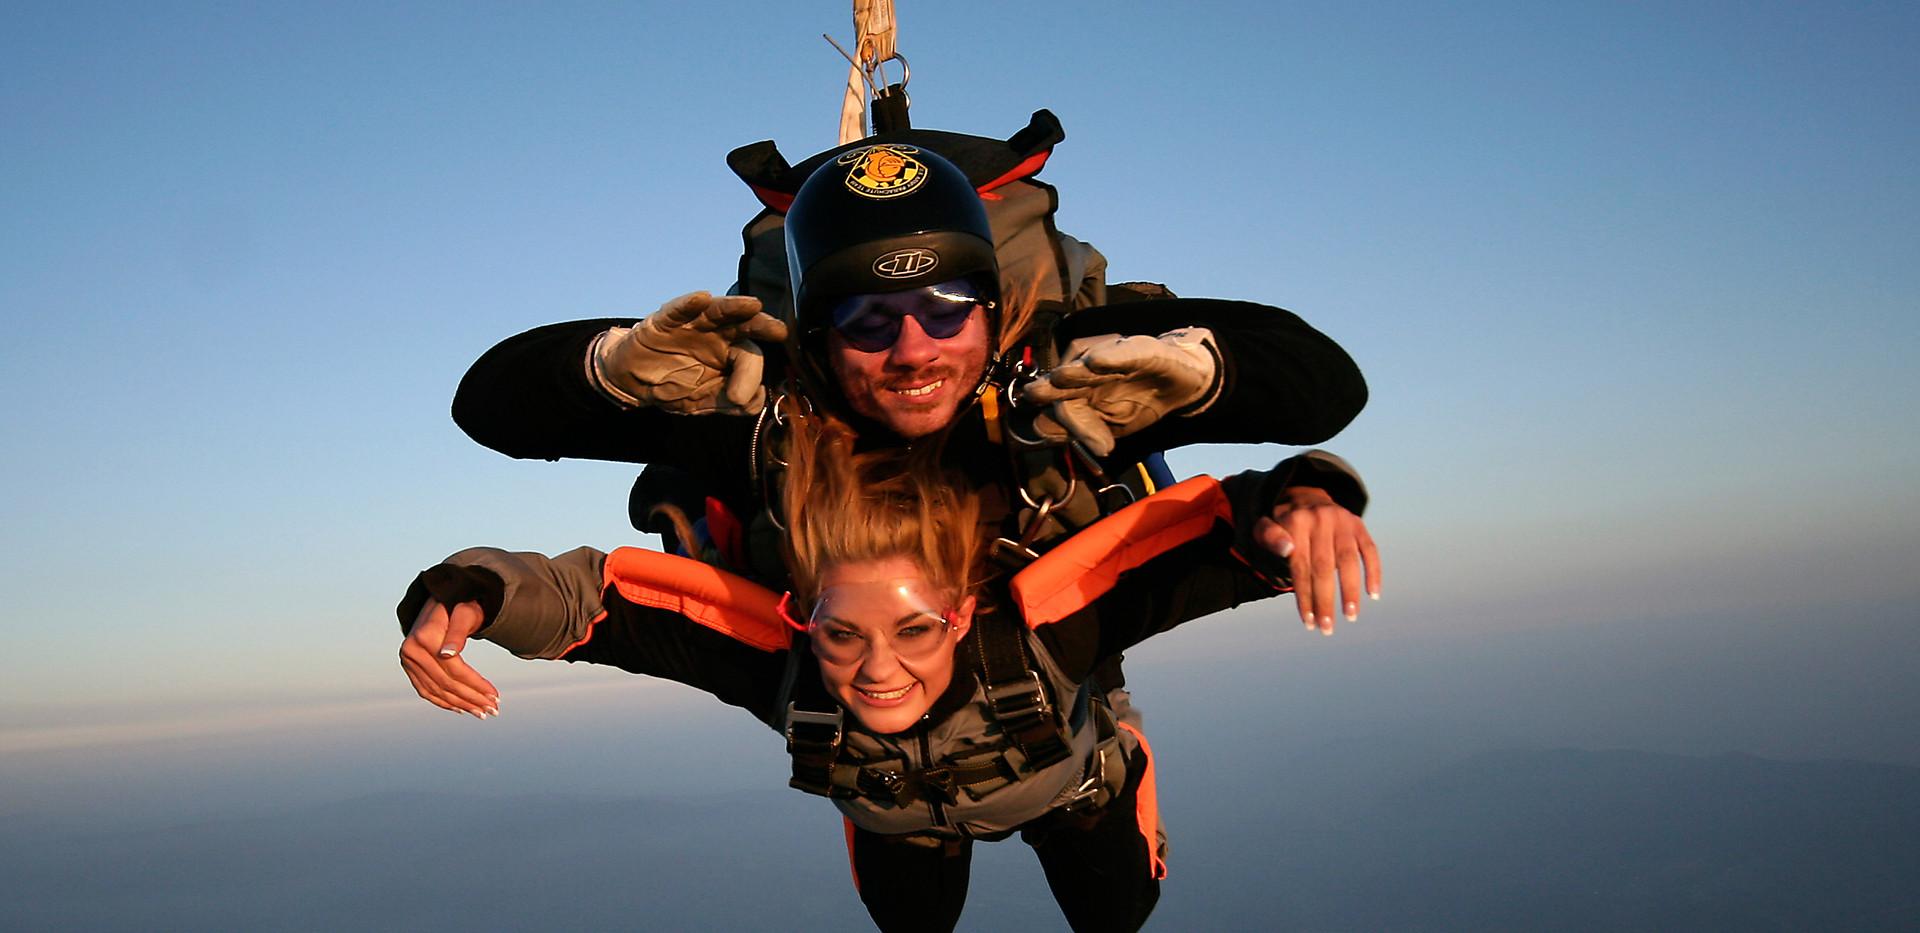 skydive bovec1.jpg